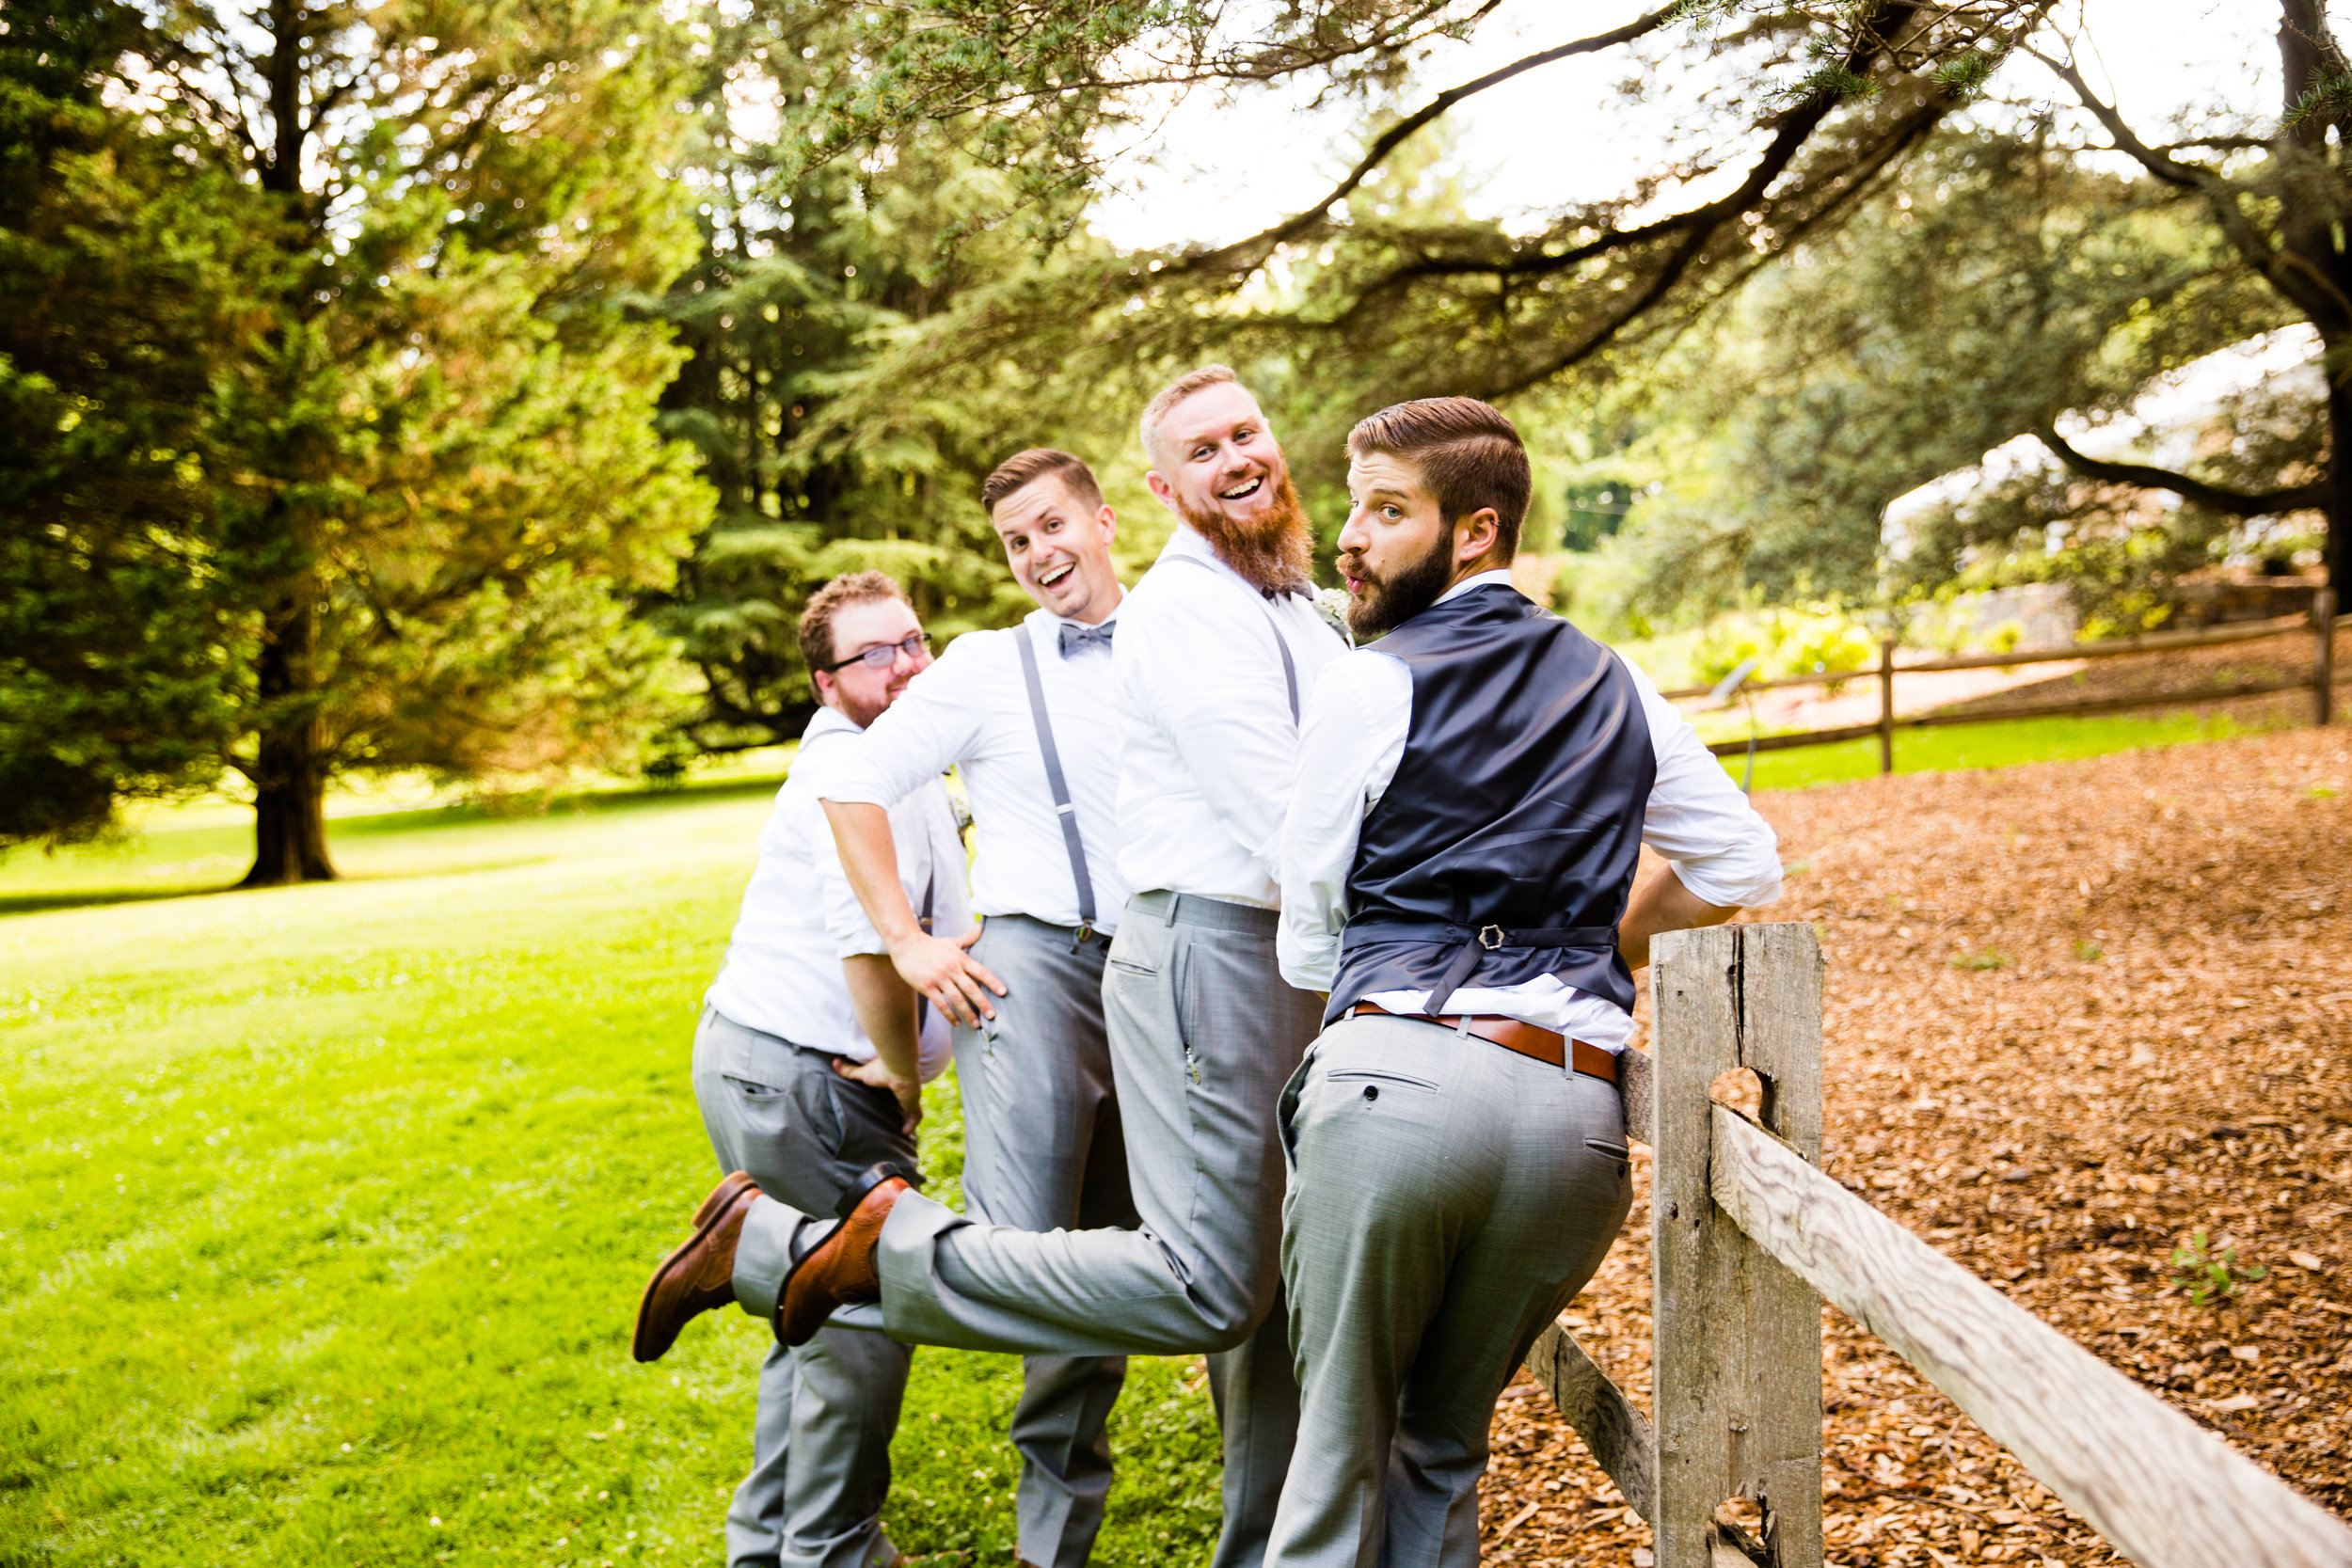 TYLER ARBORETUM WEDDING PHOTOGRAPHY LOVESTRUCK PICTURES-024.jpg